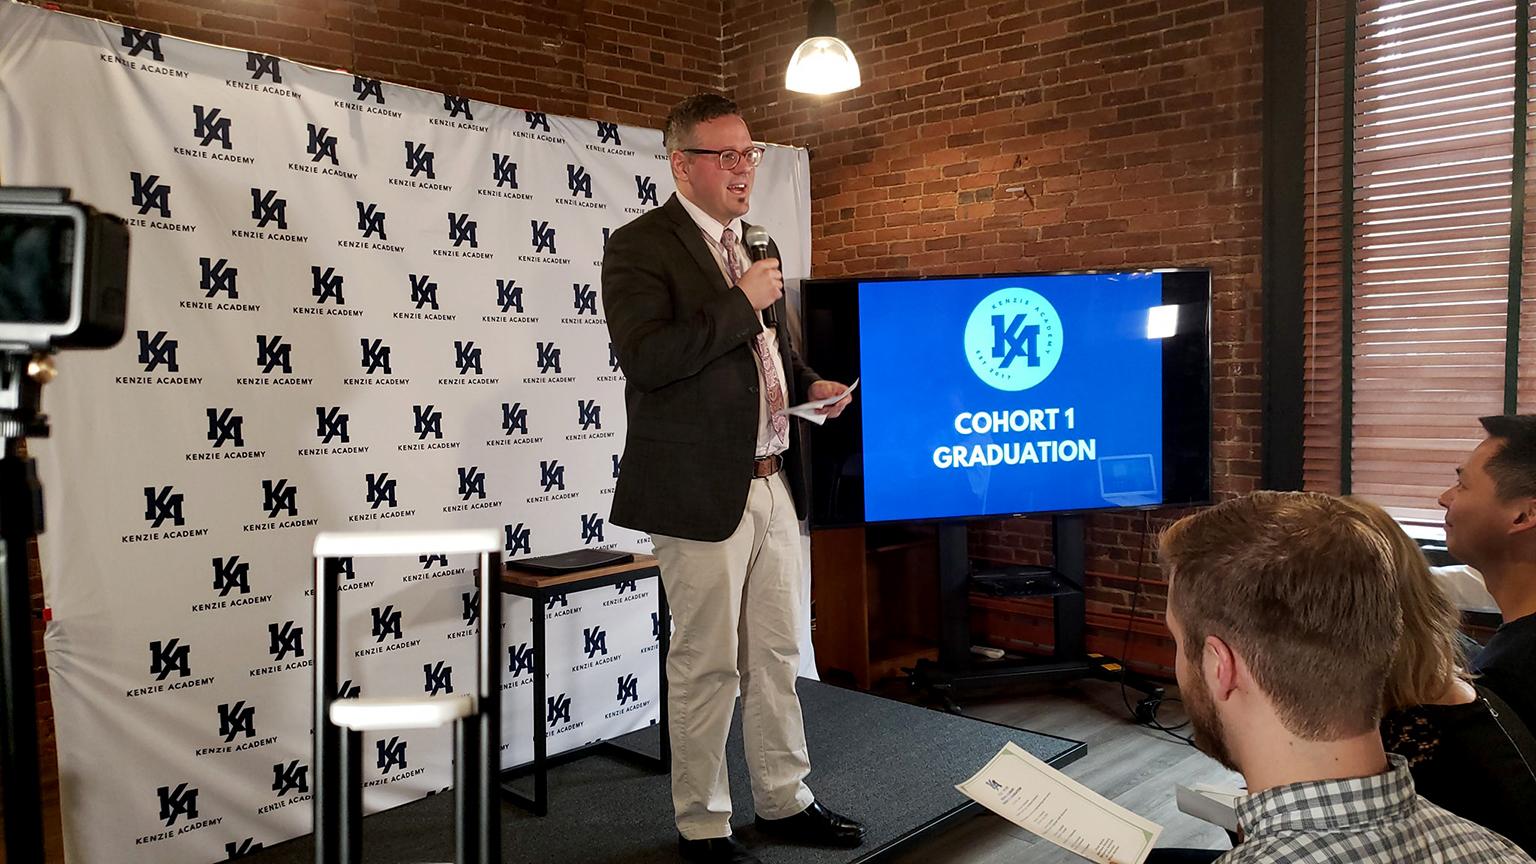 Matt Cummings, Indy Campus Director, Addressing the Graduating Cohort